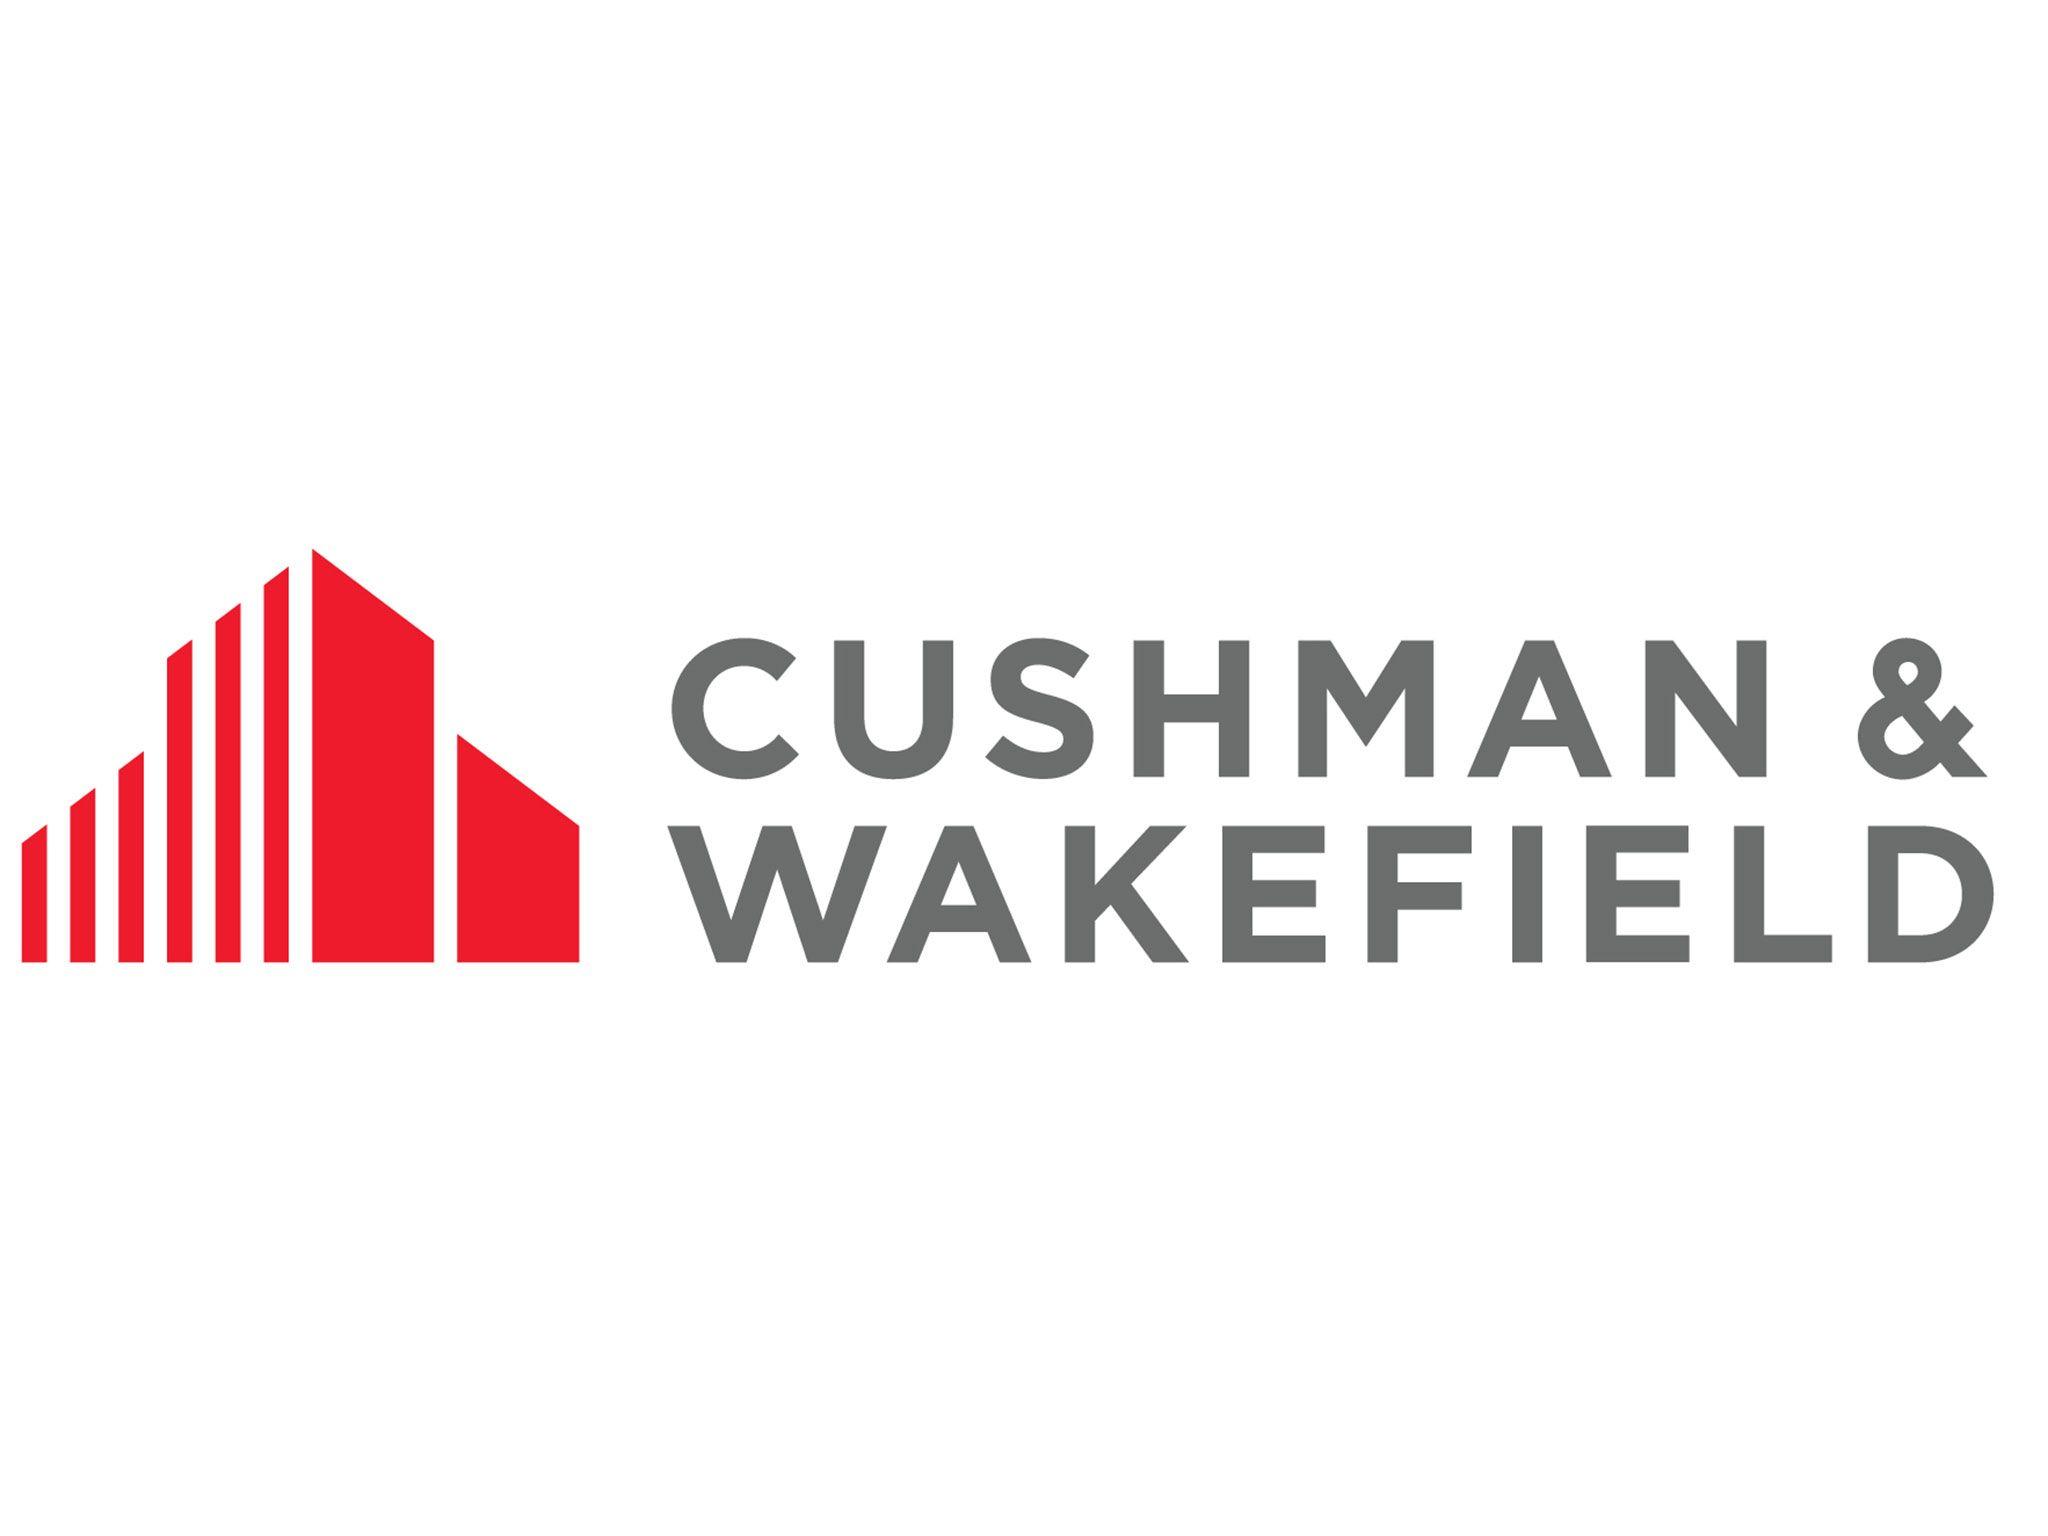 Cushman-_-Wakefield-logo.jpg